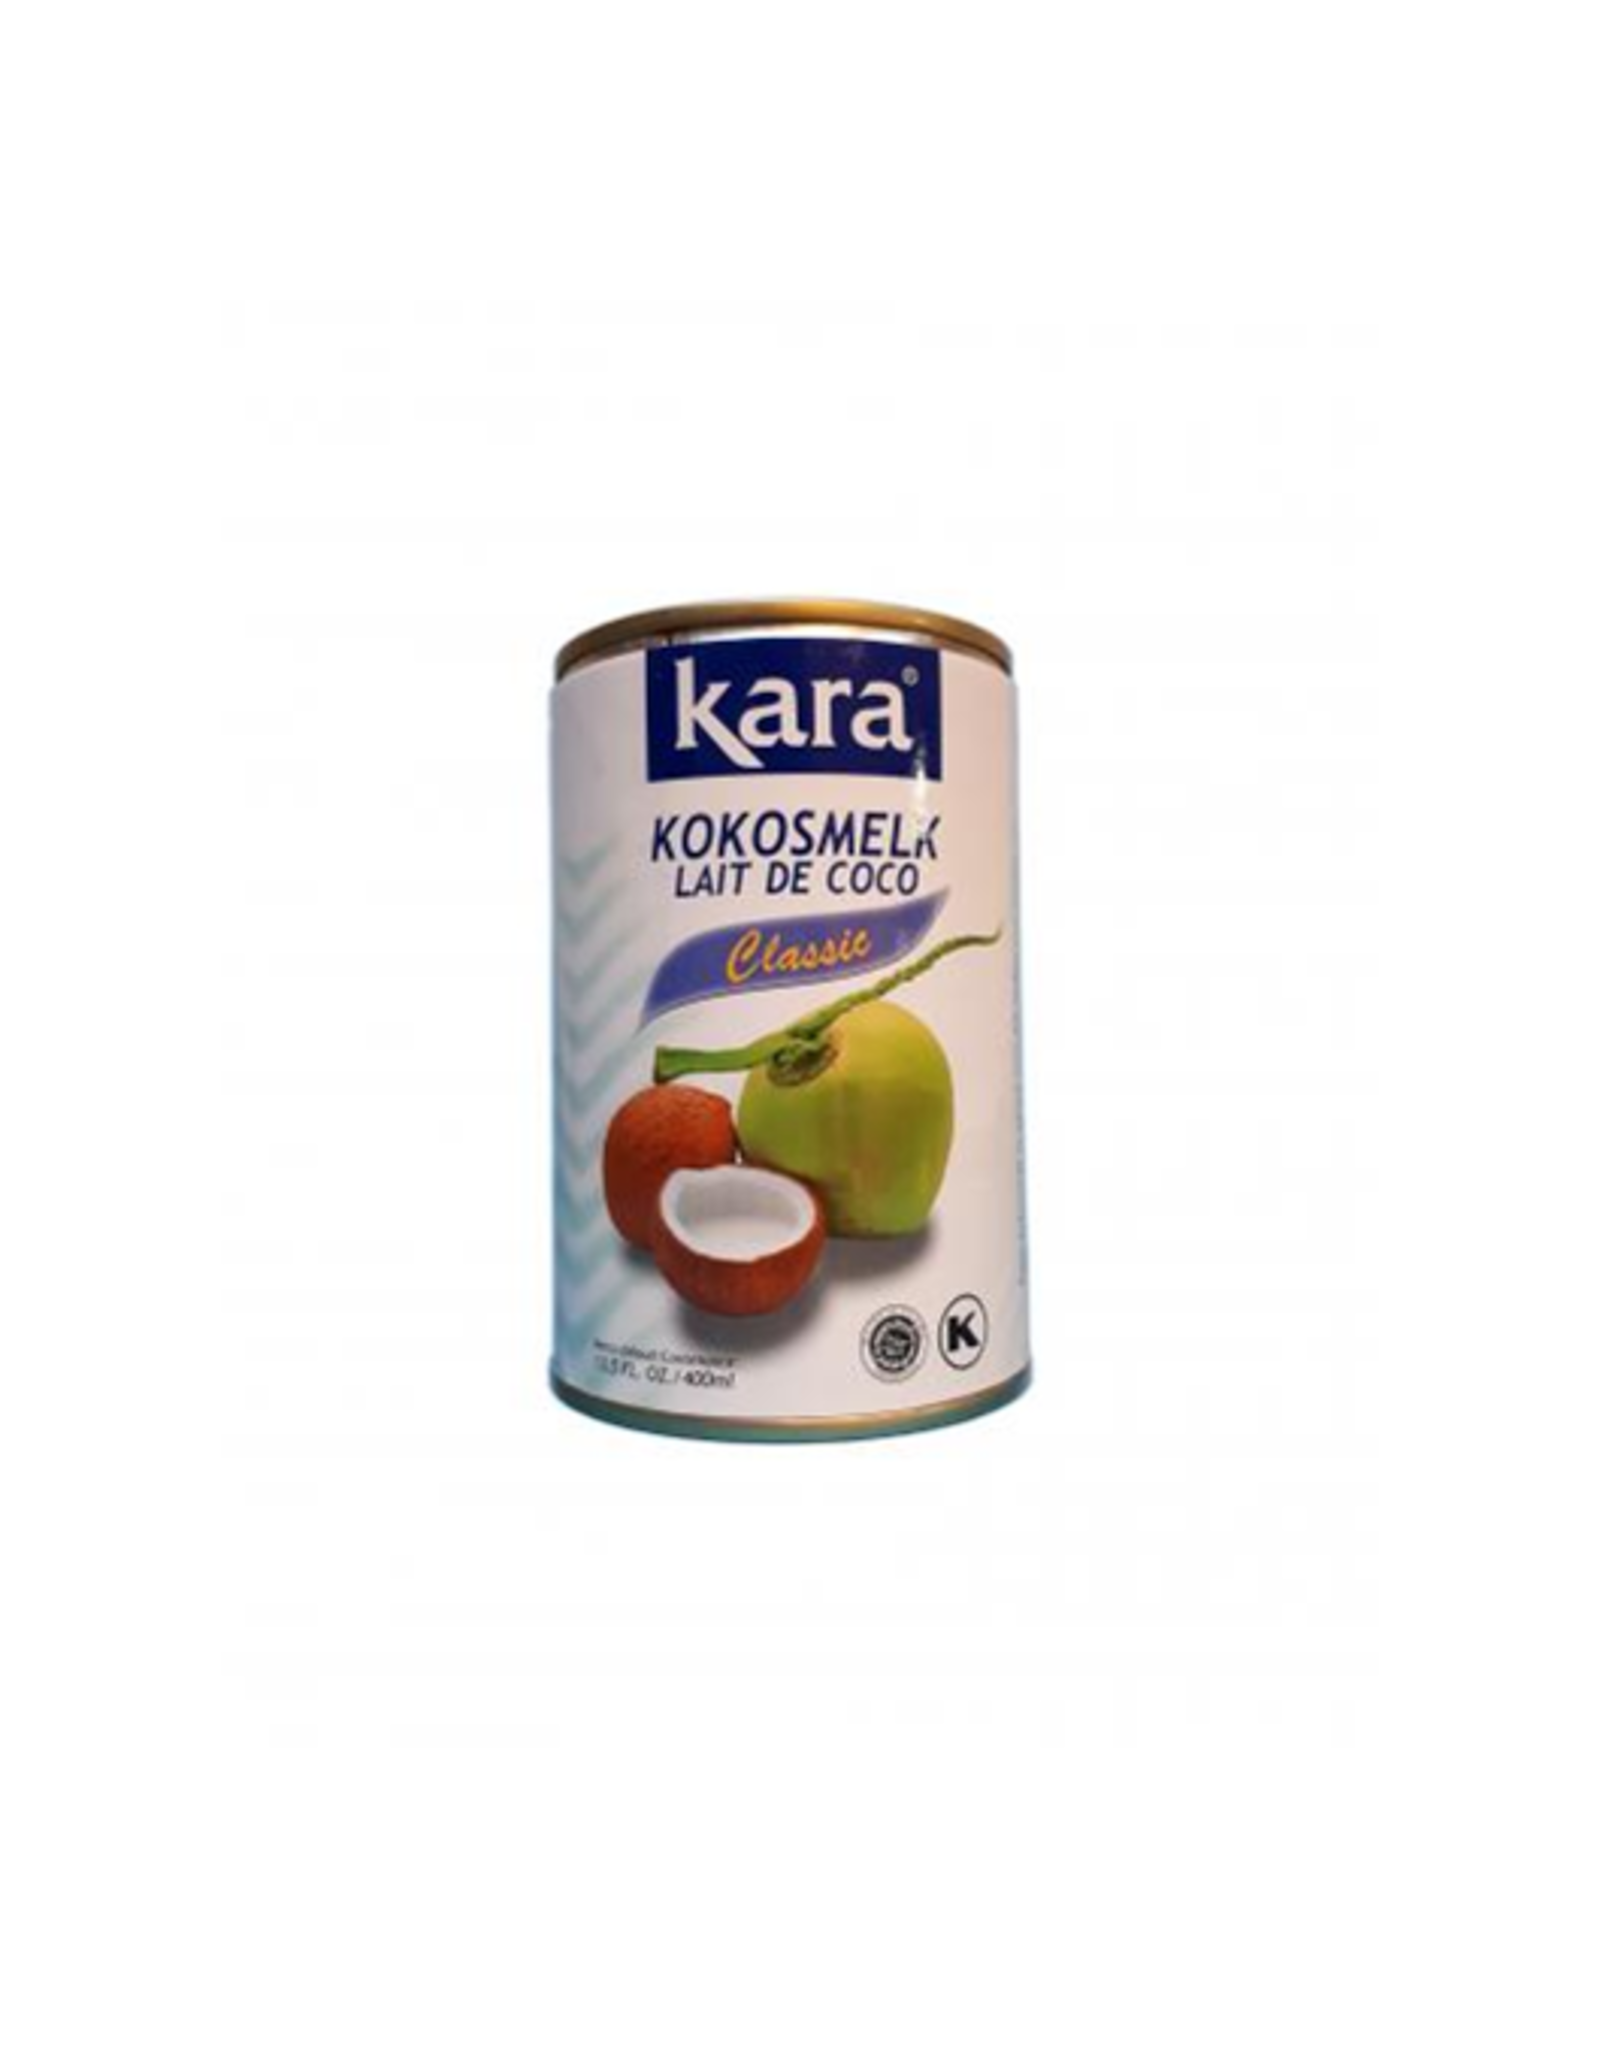 Kara Kokosmelk Classic blik